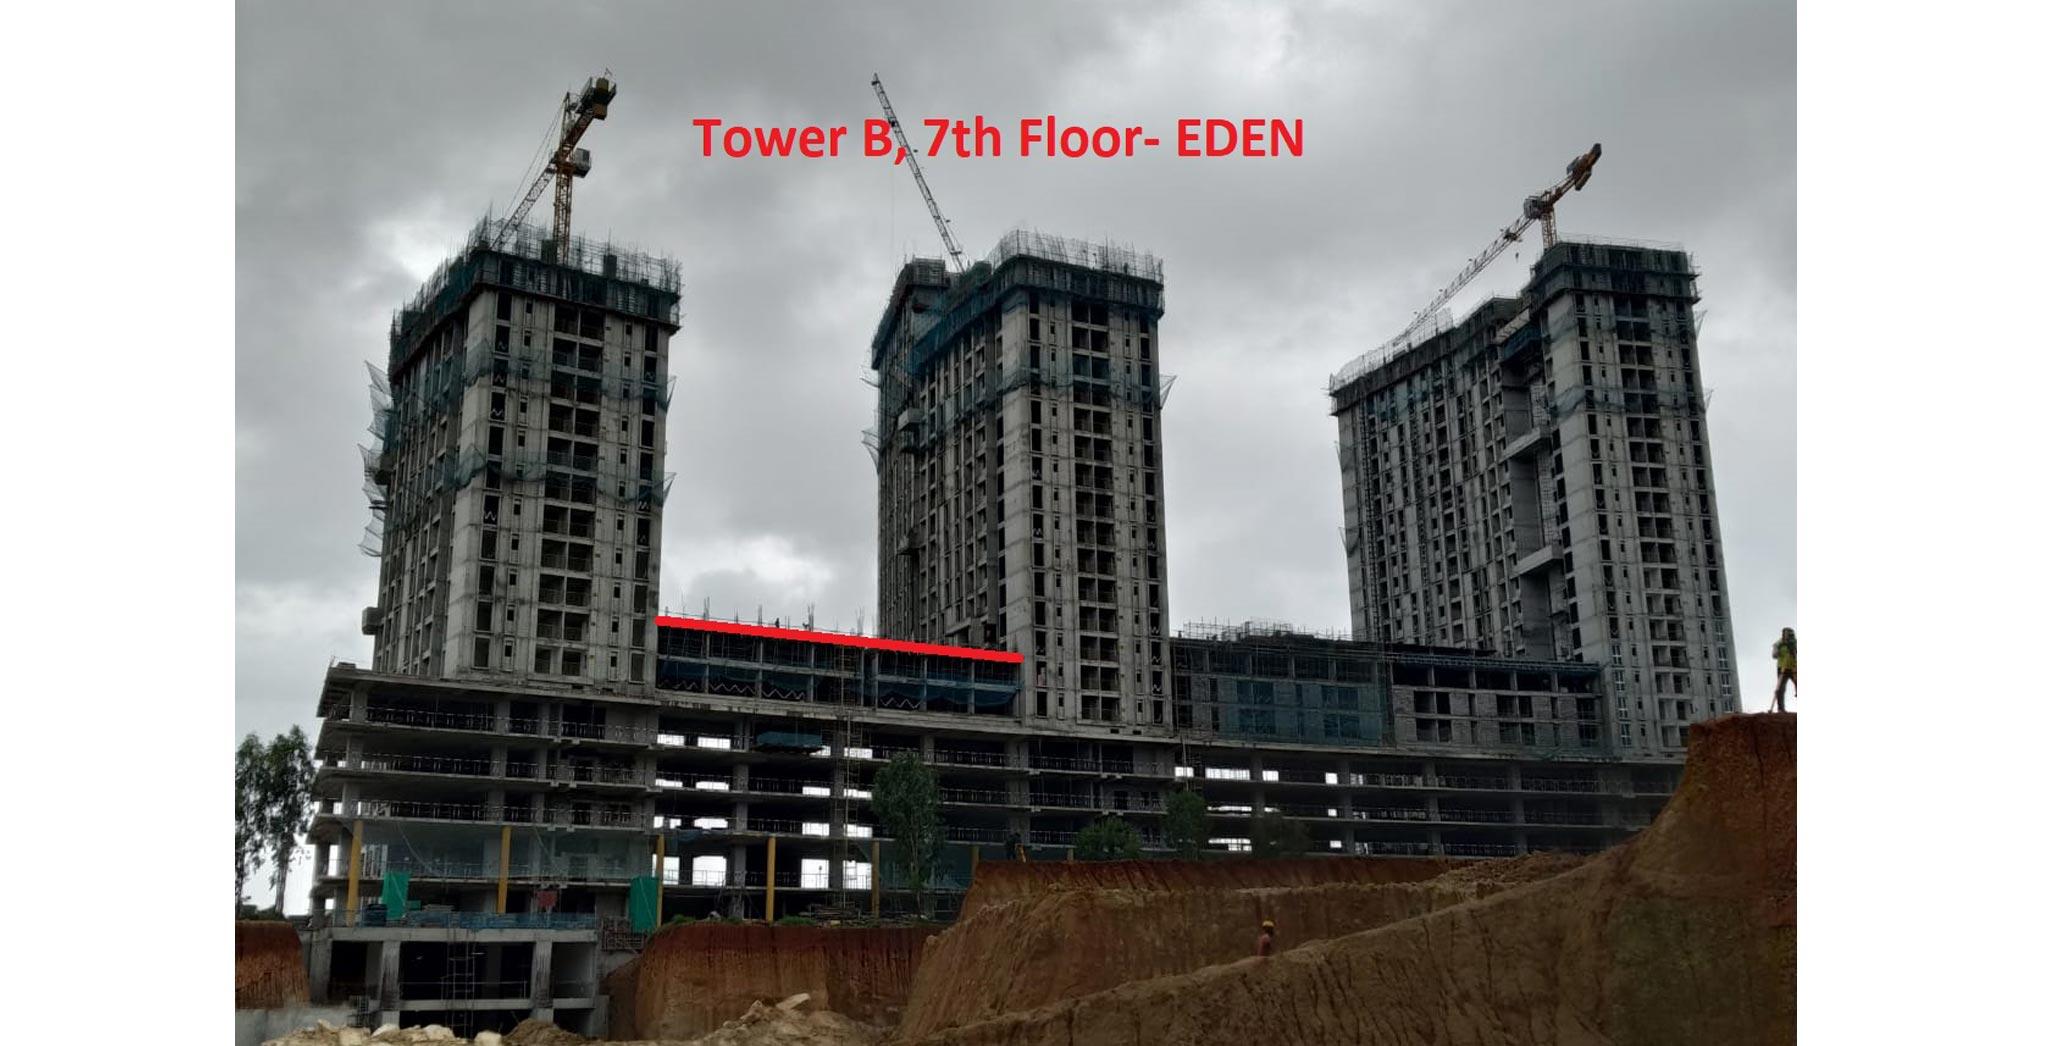 Jul 2021 - Eden-Tower B - Completion of 7th floor slab Milestone